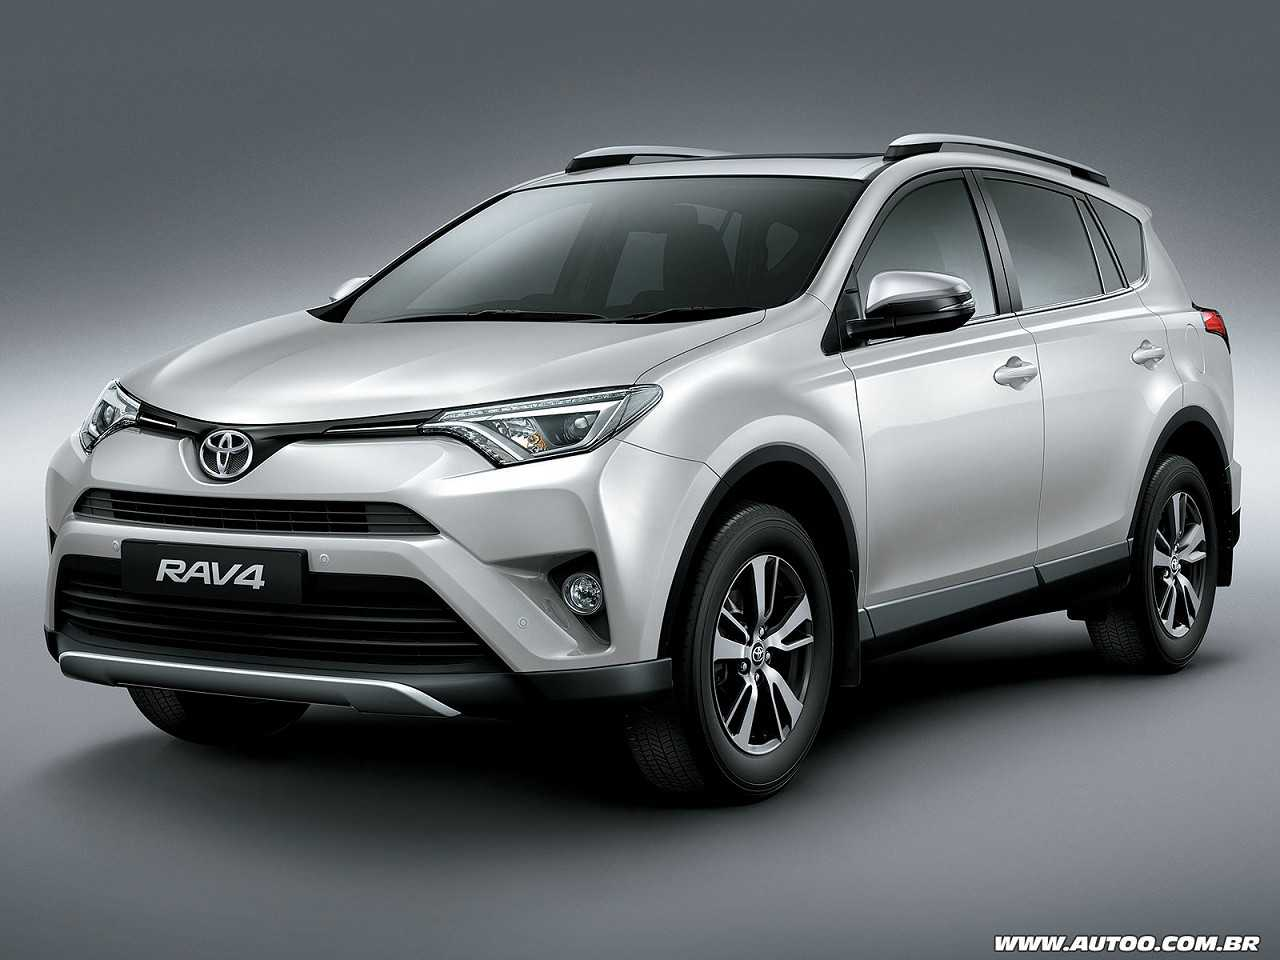 ToyotaRAV4 2017 - ângulo frontal